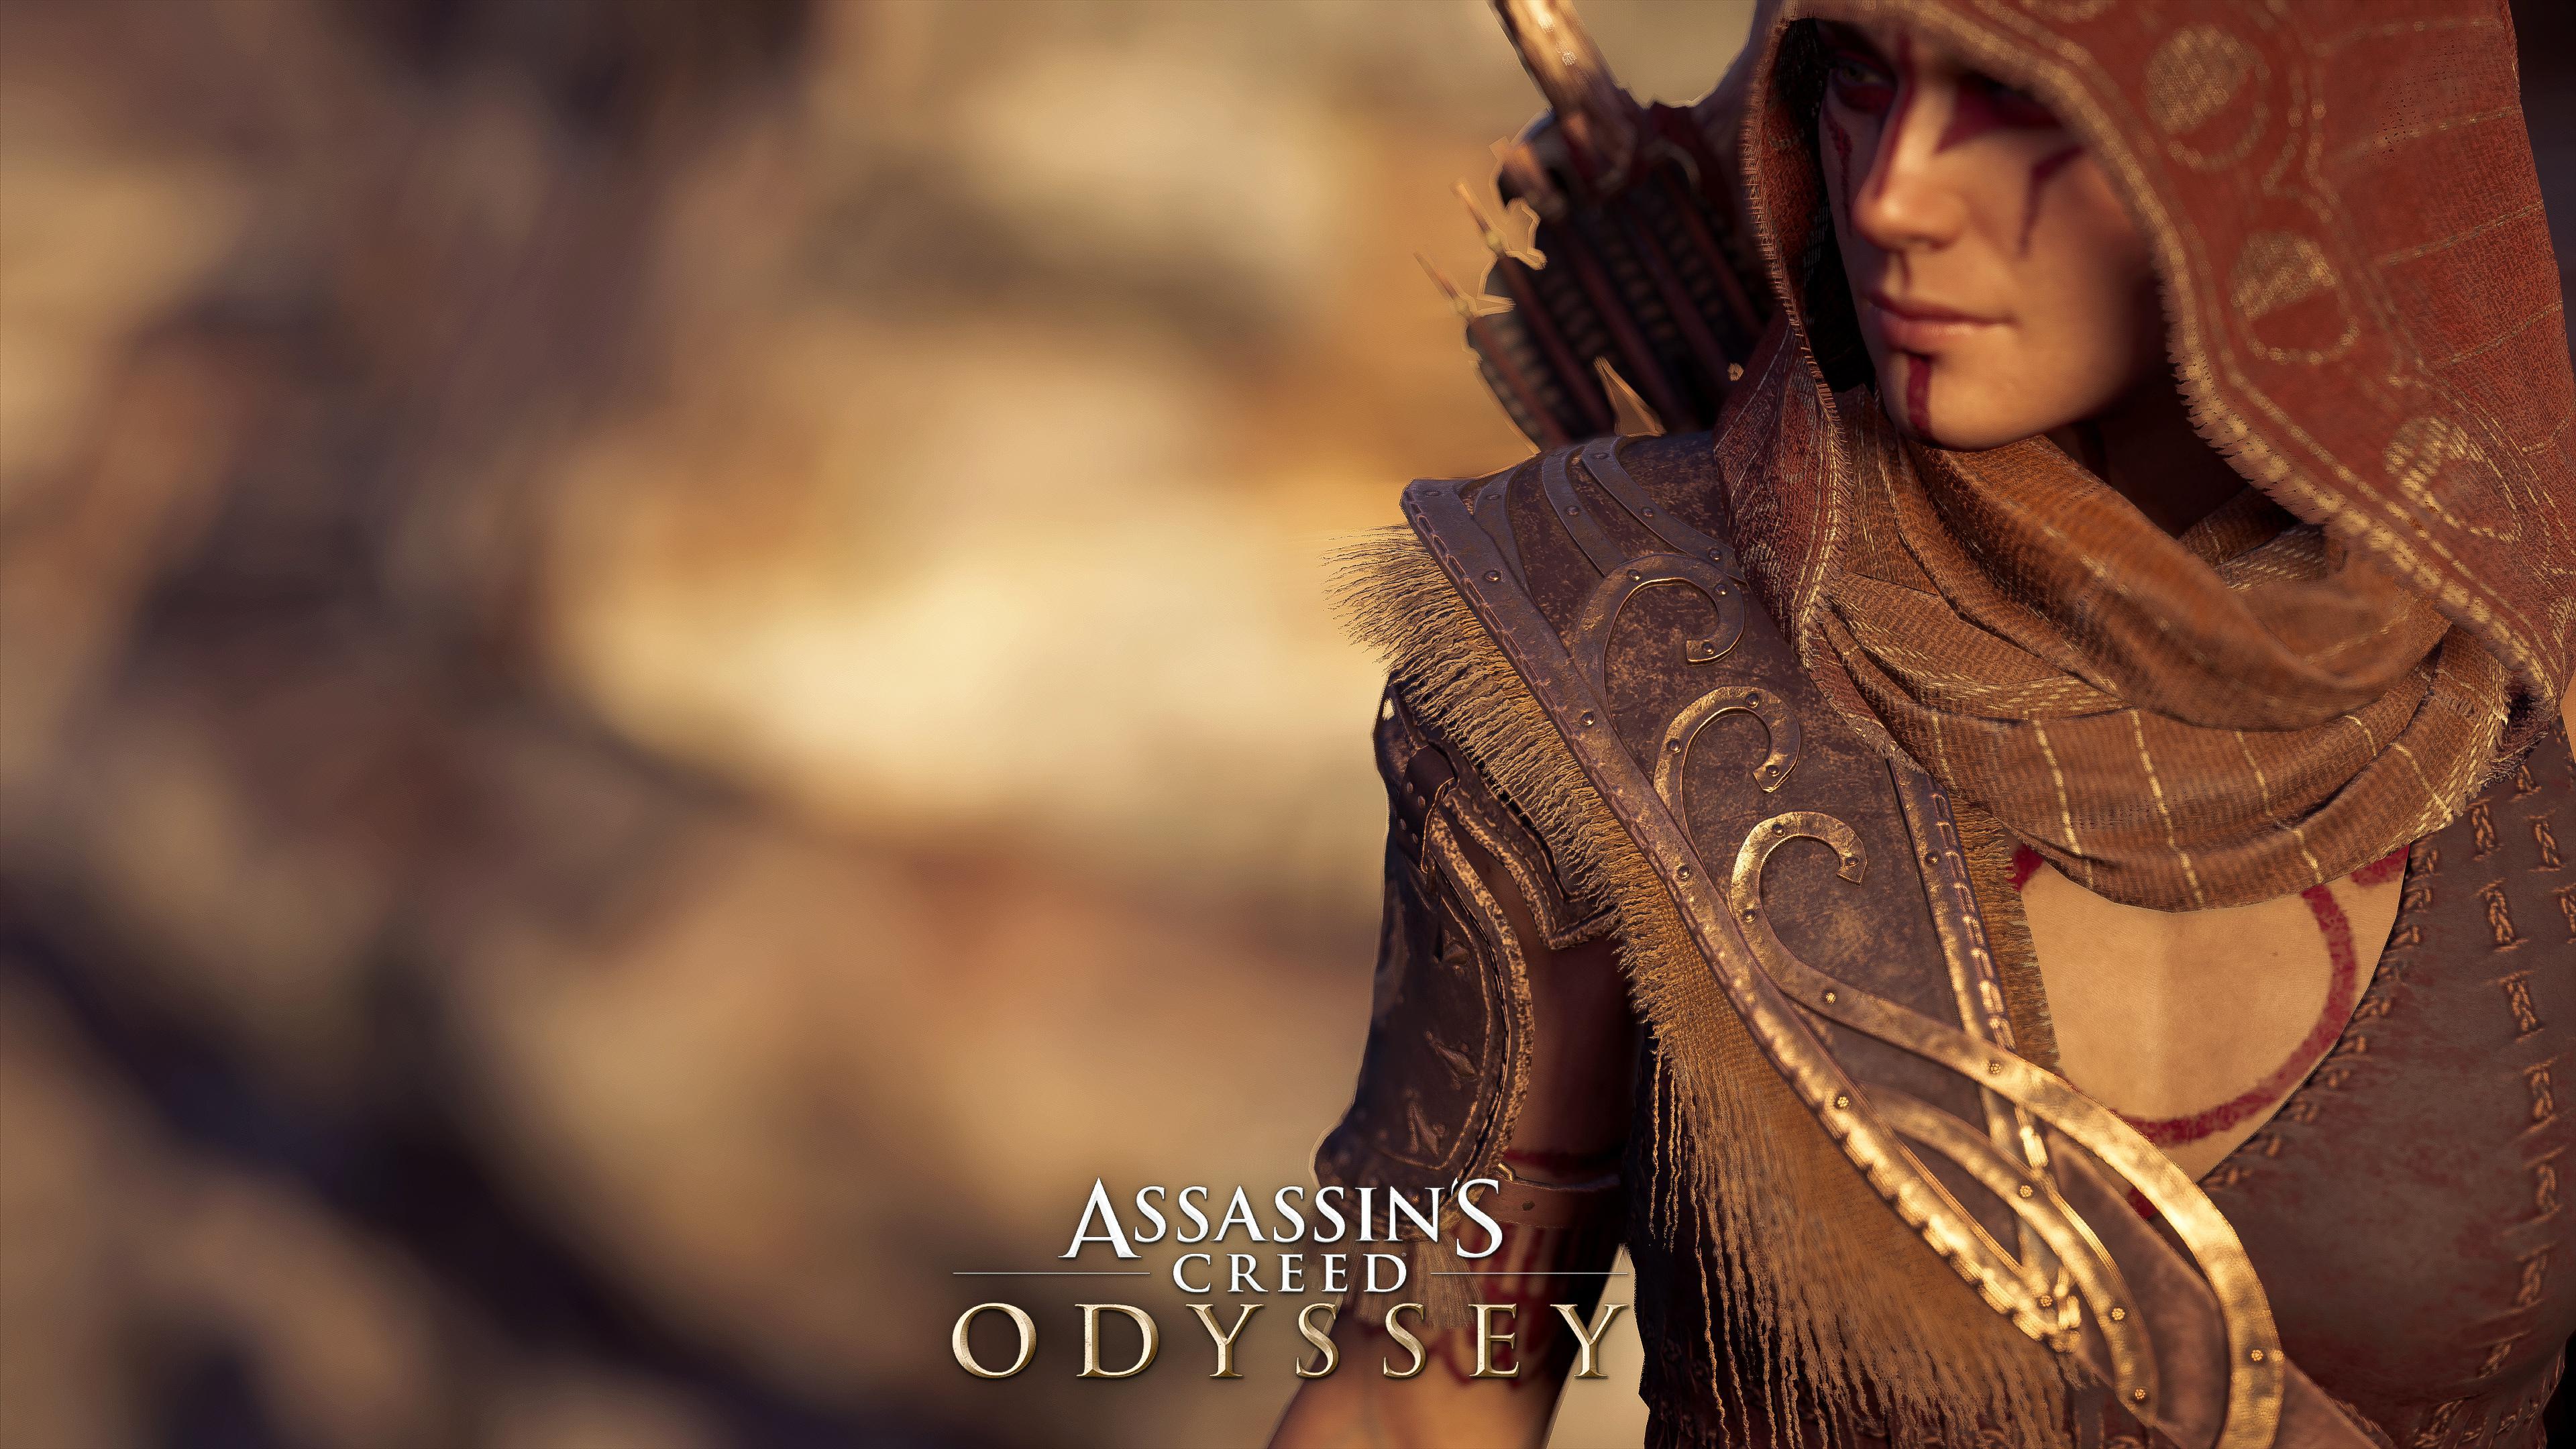 Assassin's Creed Odyssey3.jpg - Assassin's Creed: Odyssey 4к